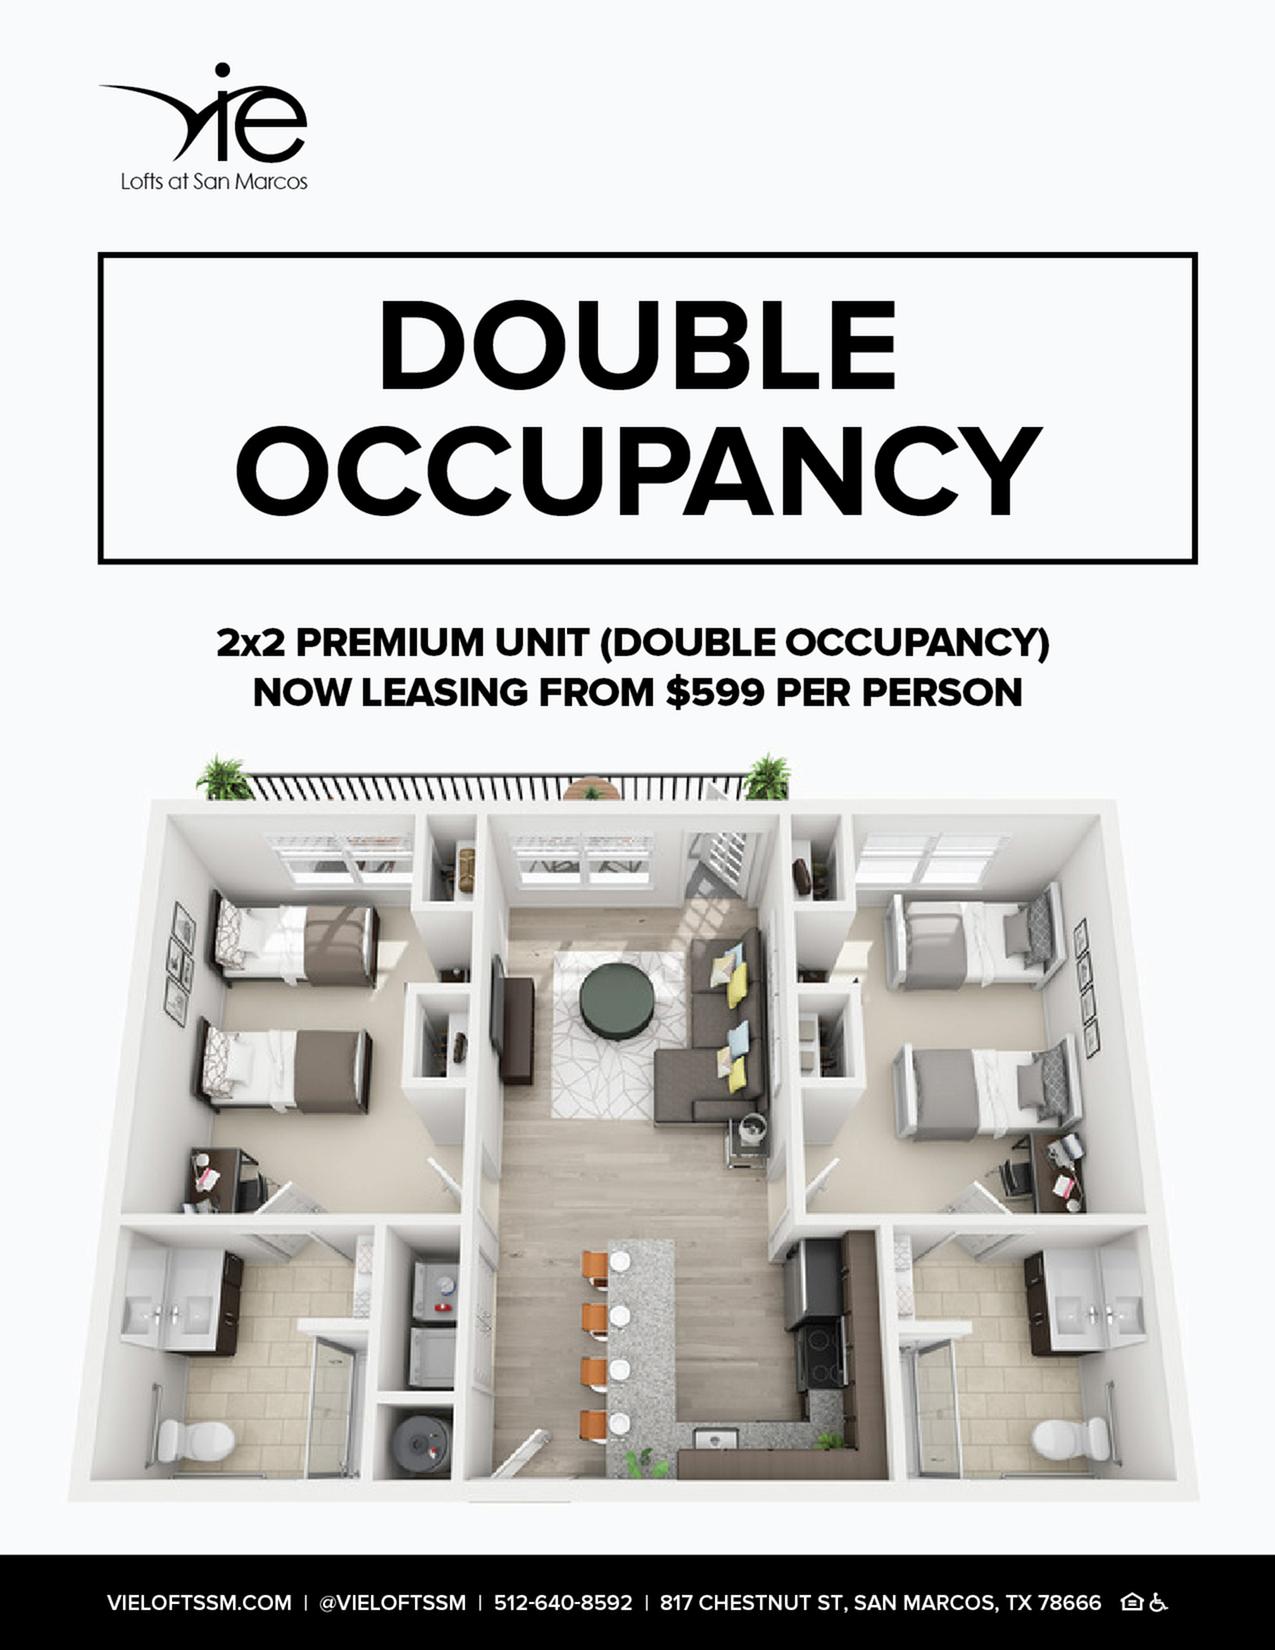 ONE ROOM, TWICE THE SAVINGS | APPLY NOW-image